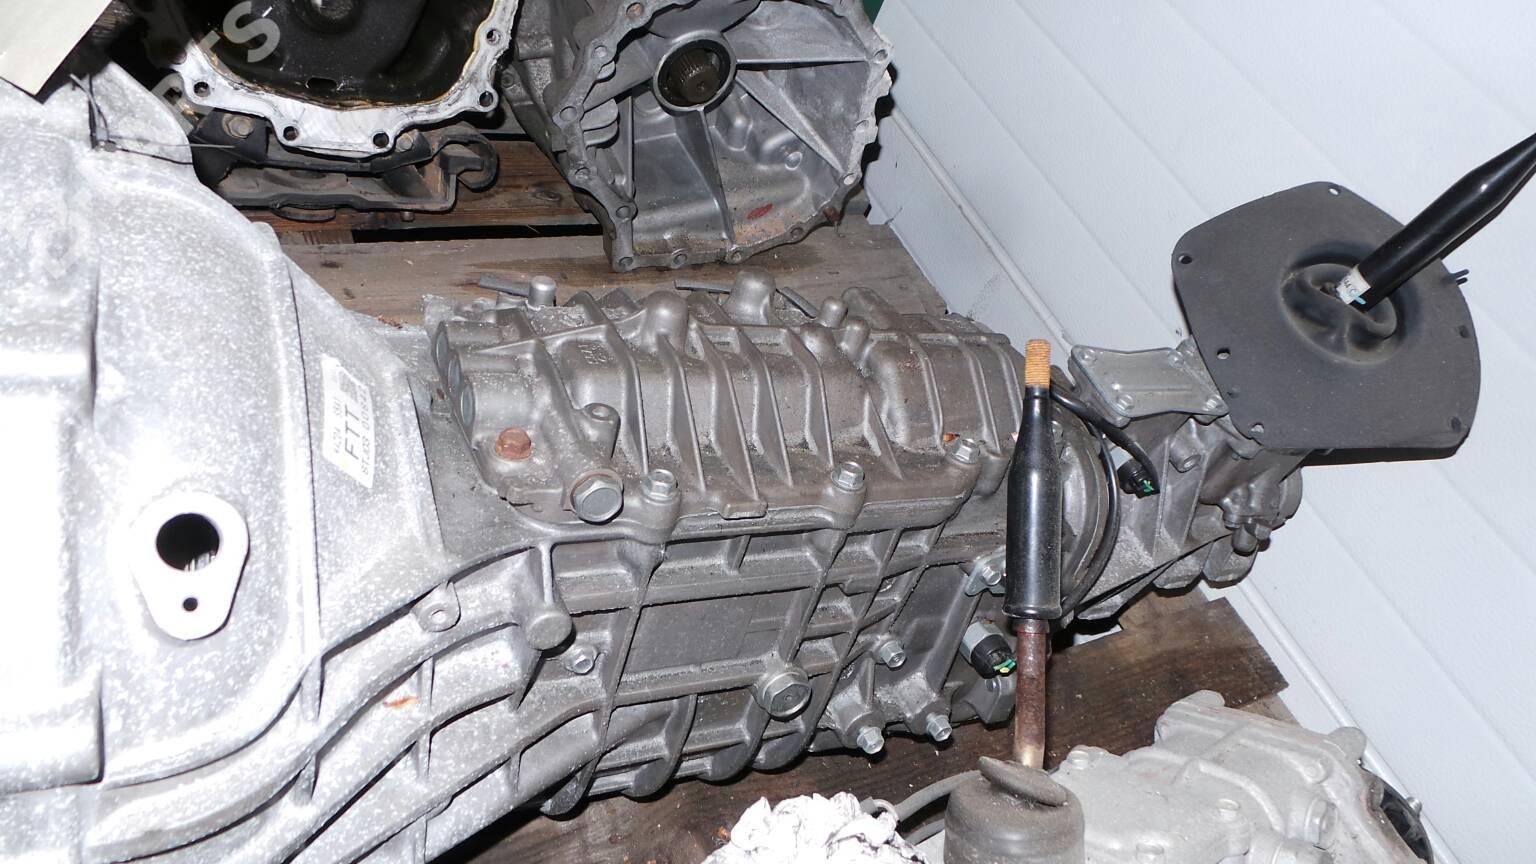 manual gearbox mazda bt 50 platform chassis cd un 2 5 cdvi 14678 rh b parts com Mazda BT-50 Thailand BT-50 Mazda Truck